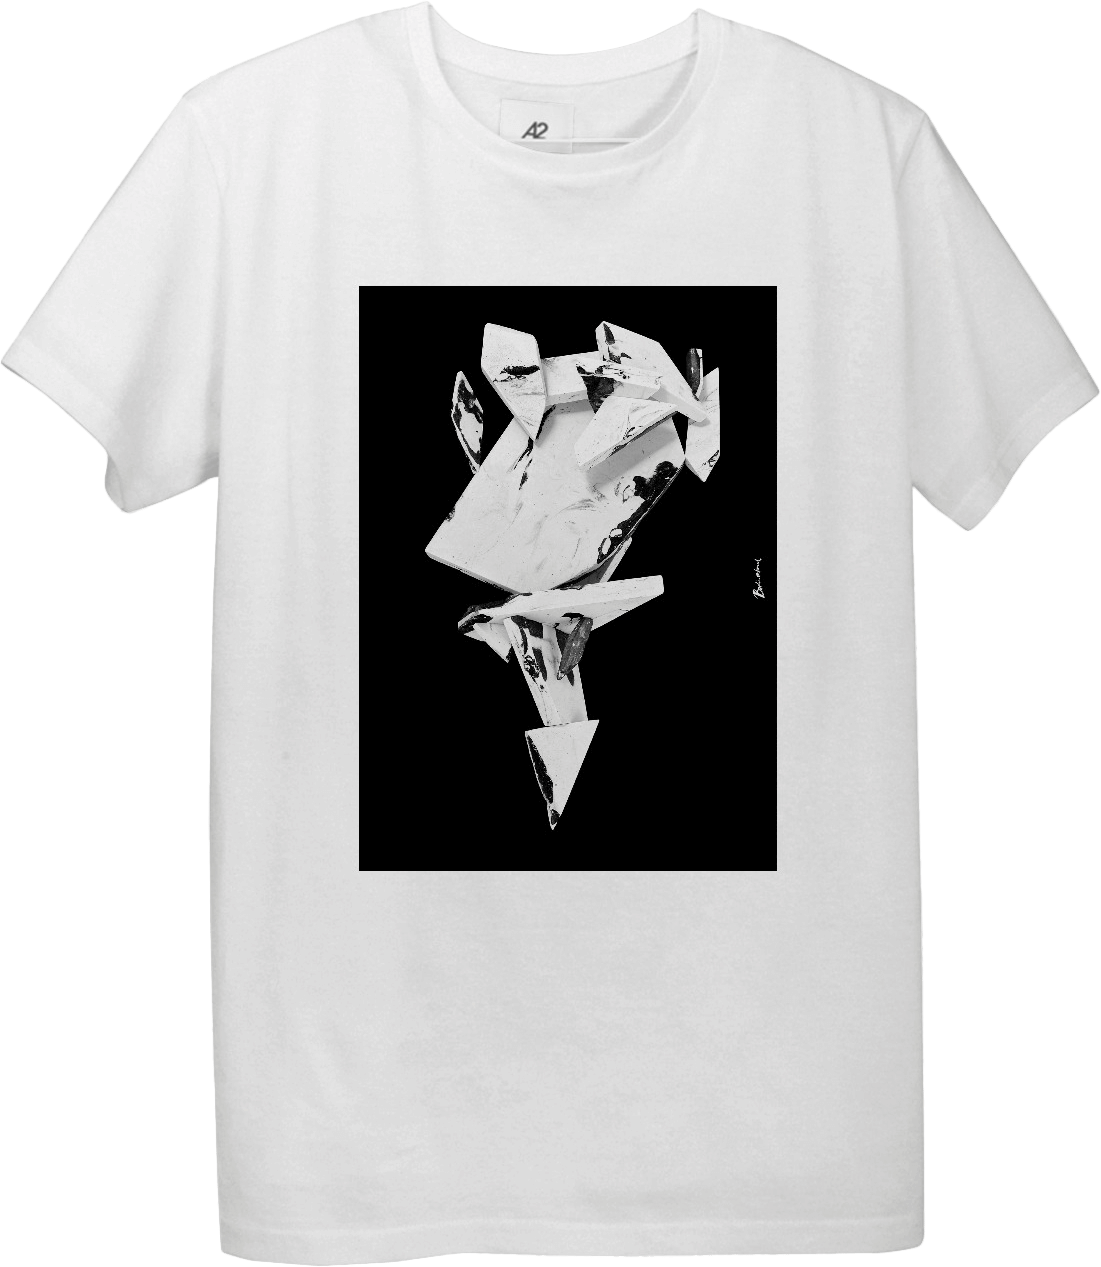 T shirt black and white designs - Design_shirt_black